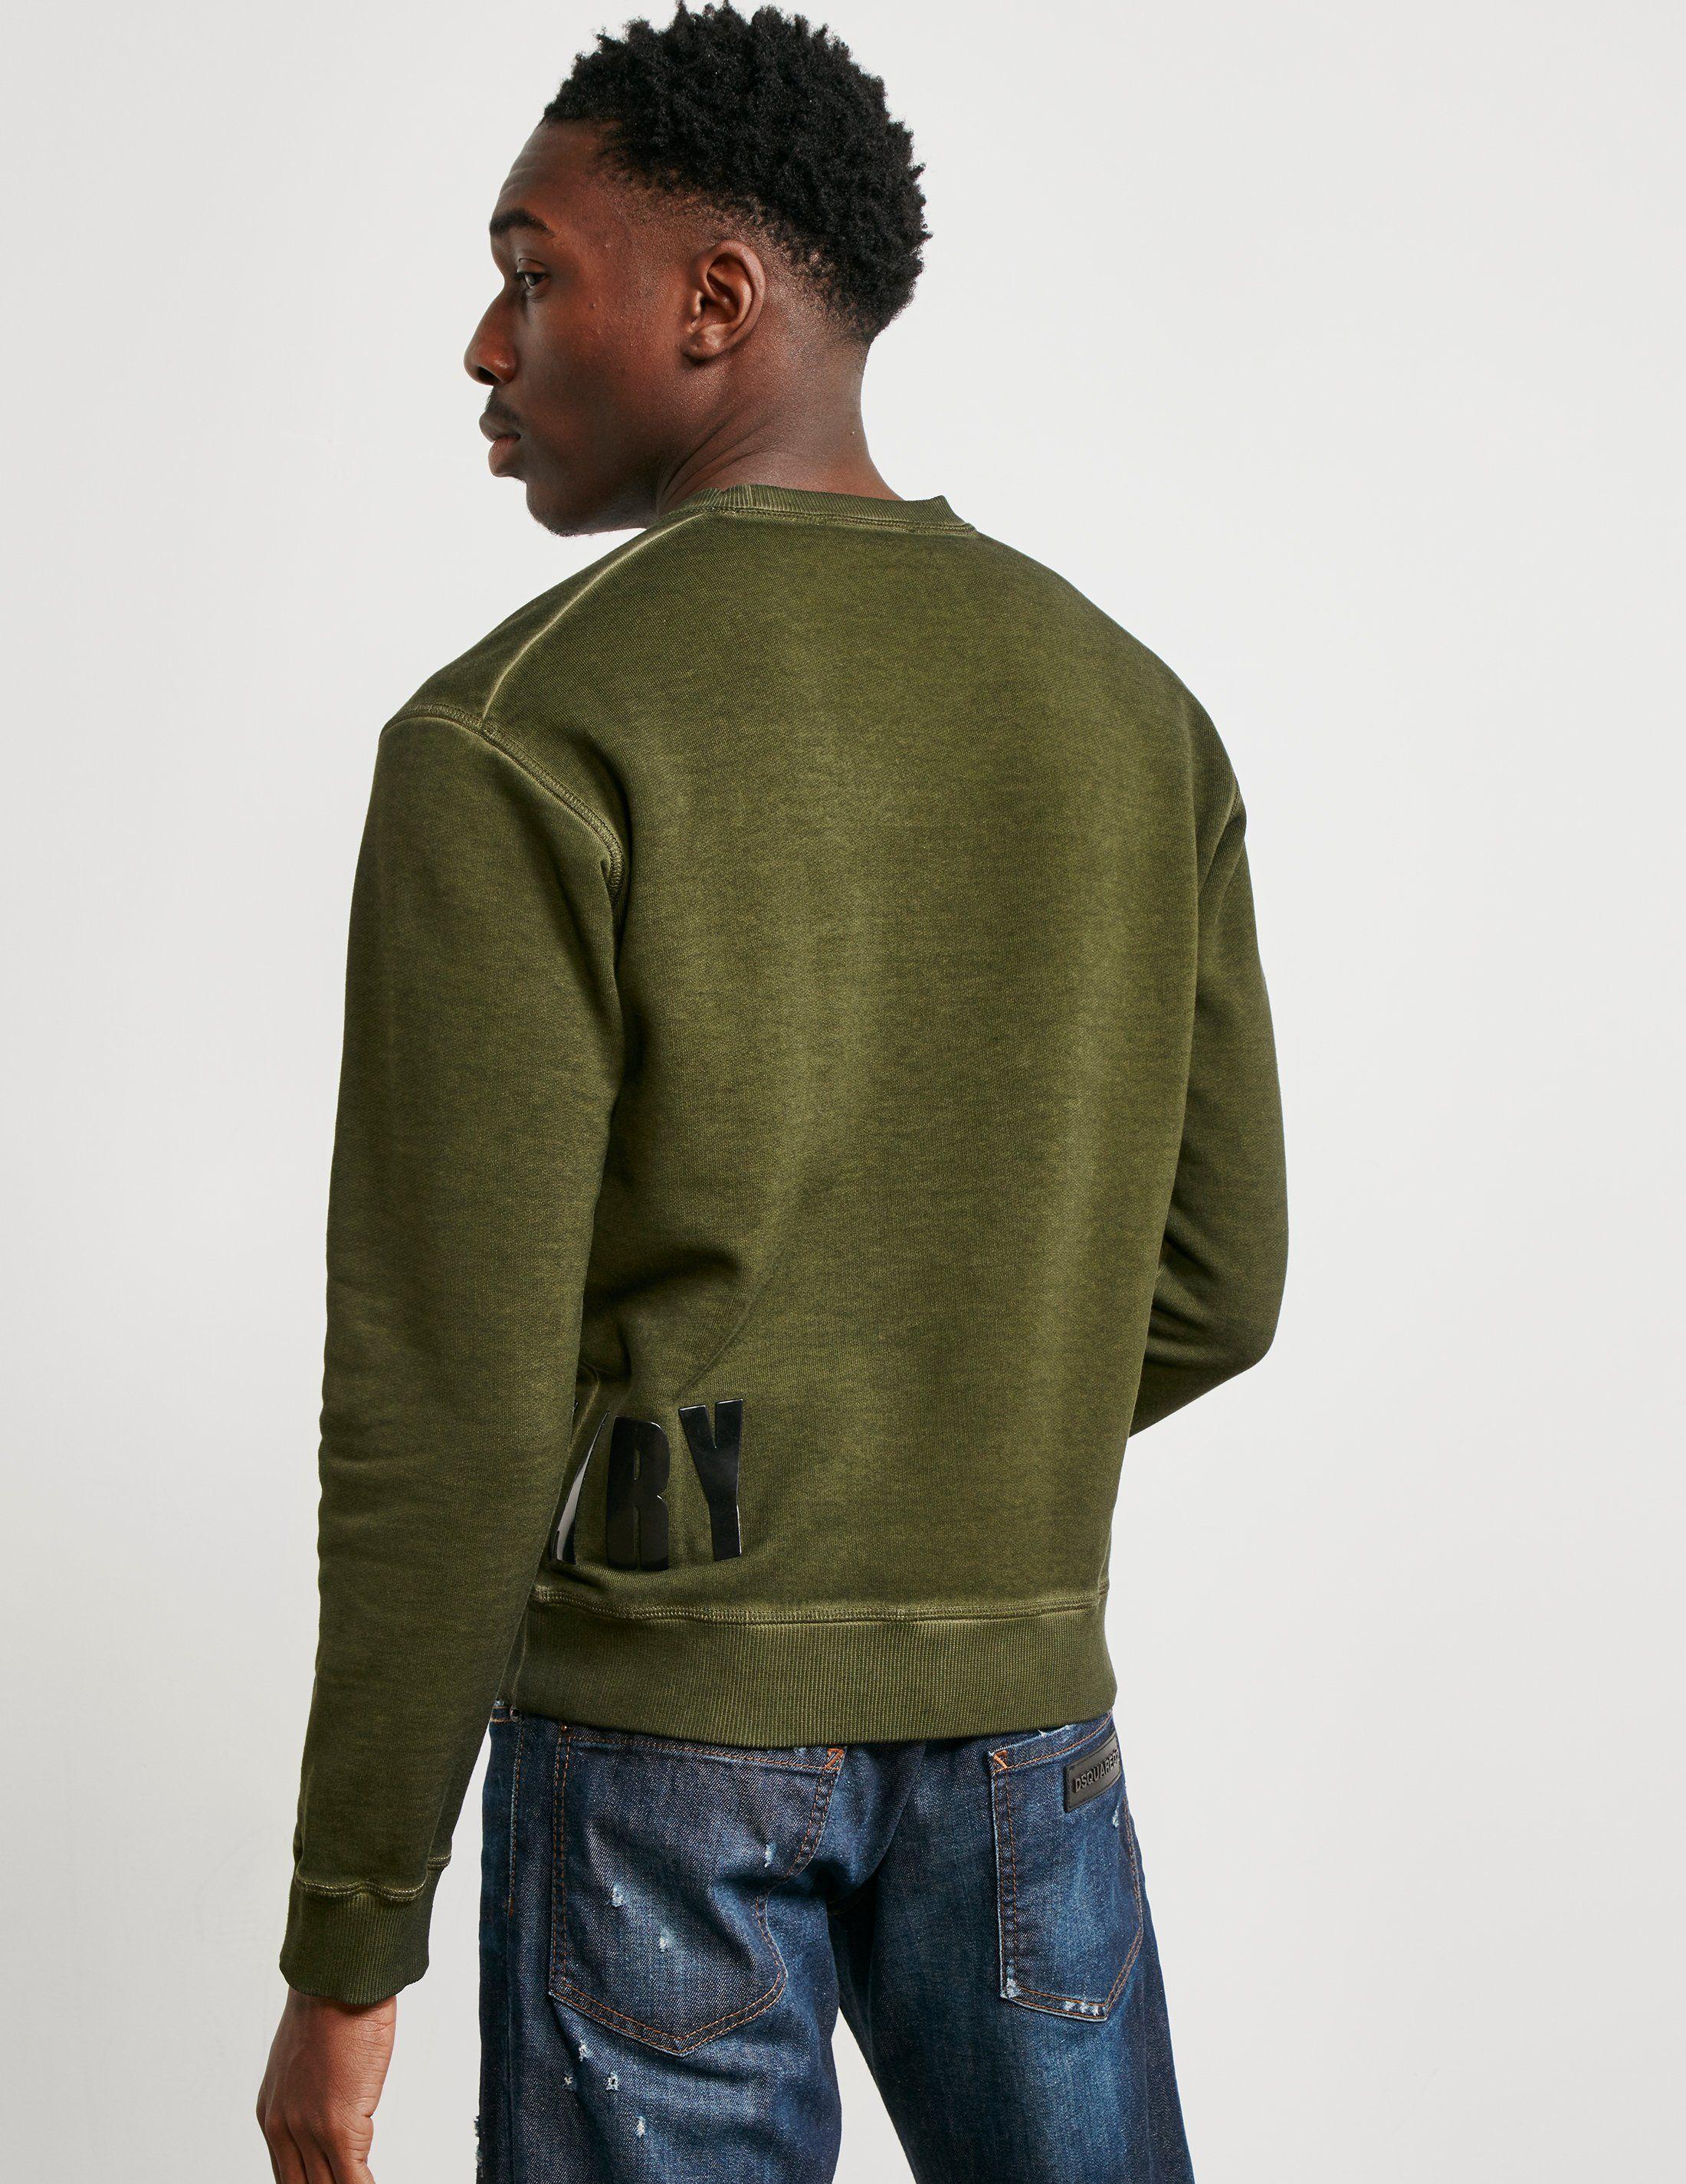 Dsquared2 Military Sweatshirt